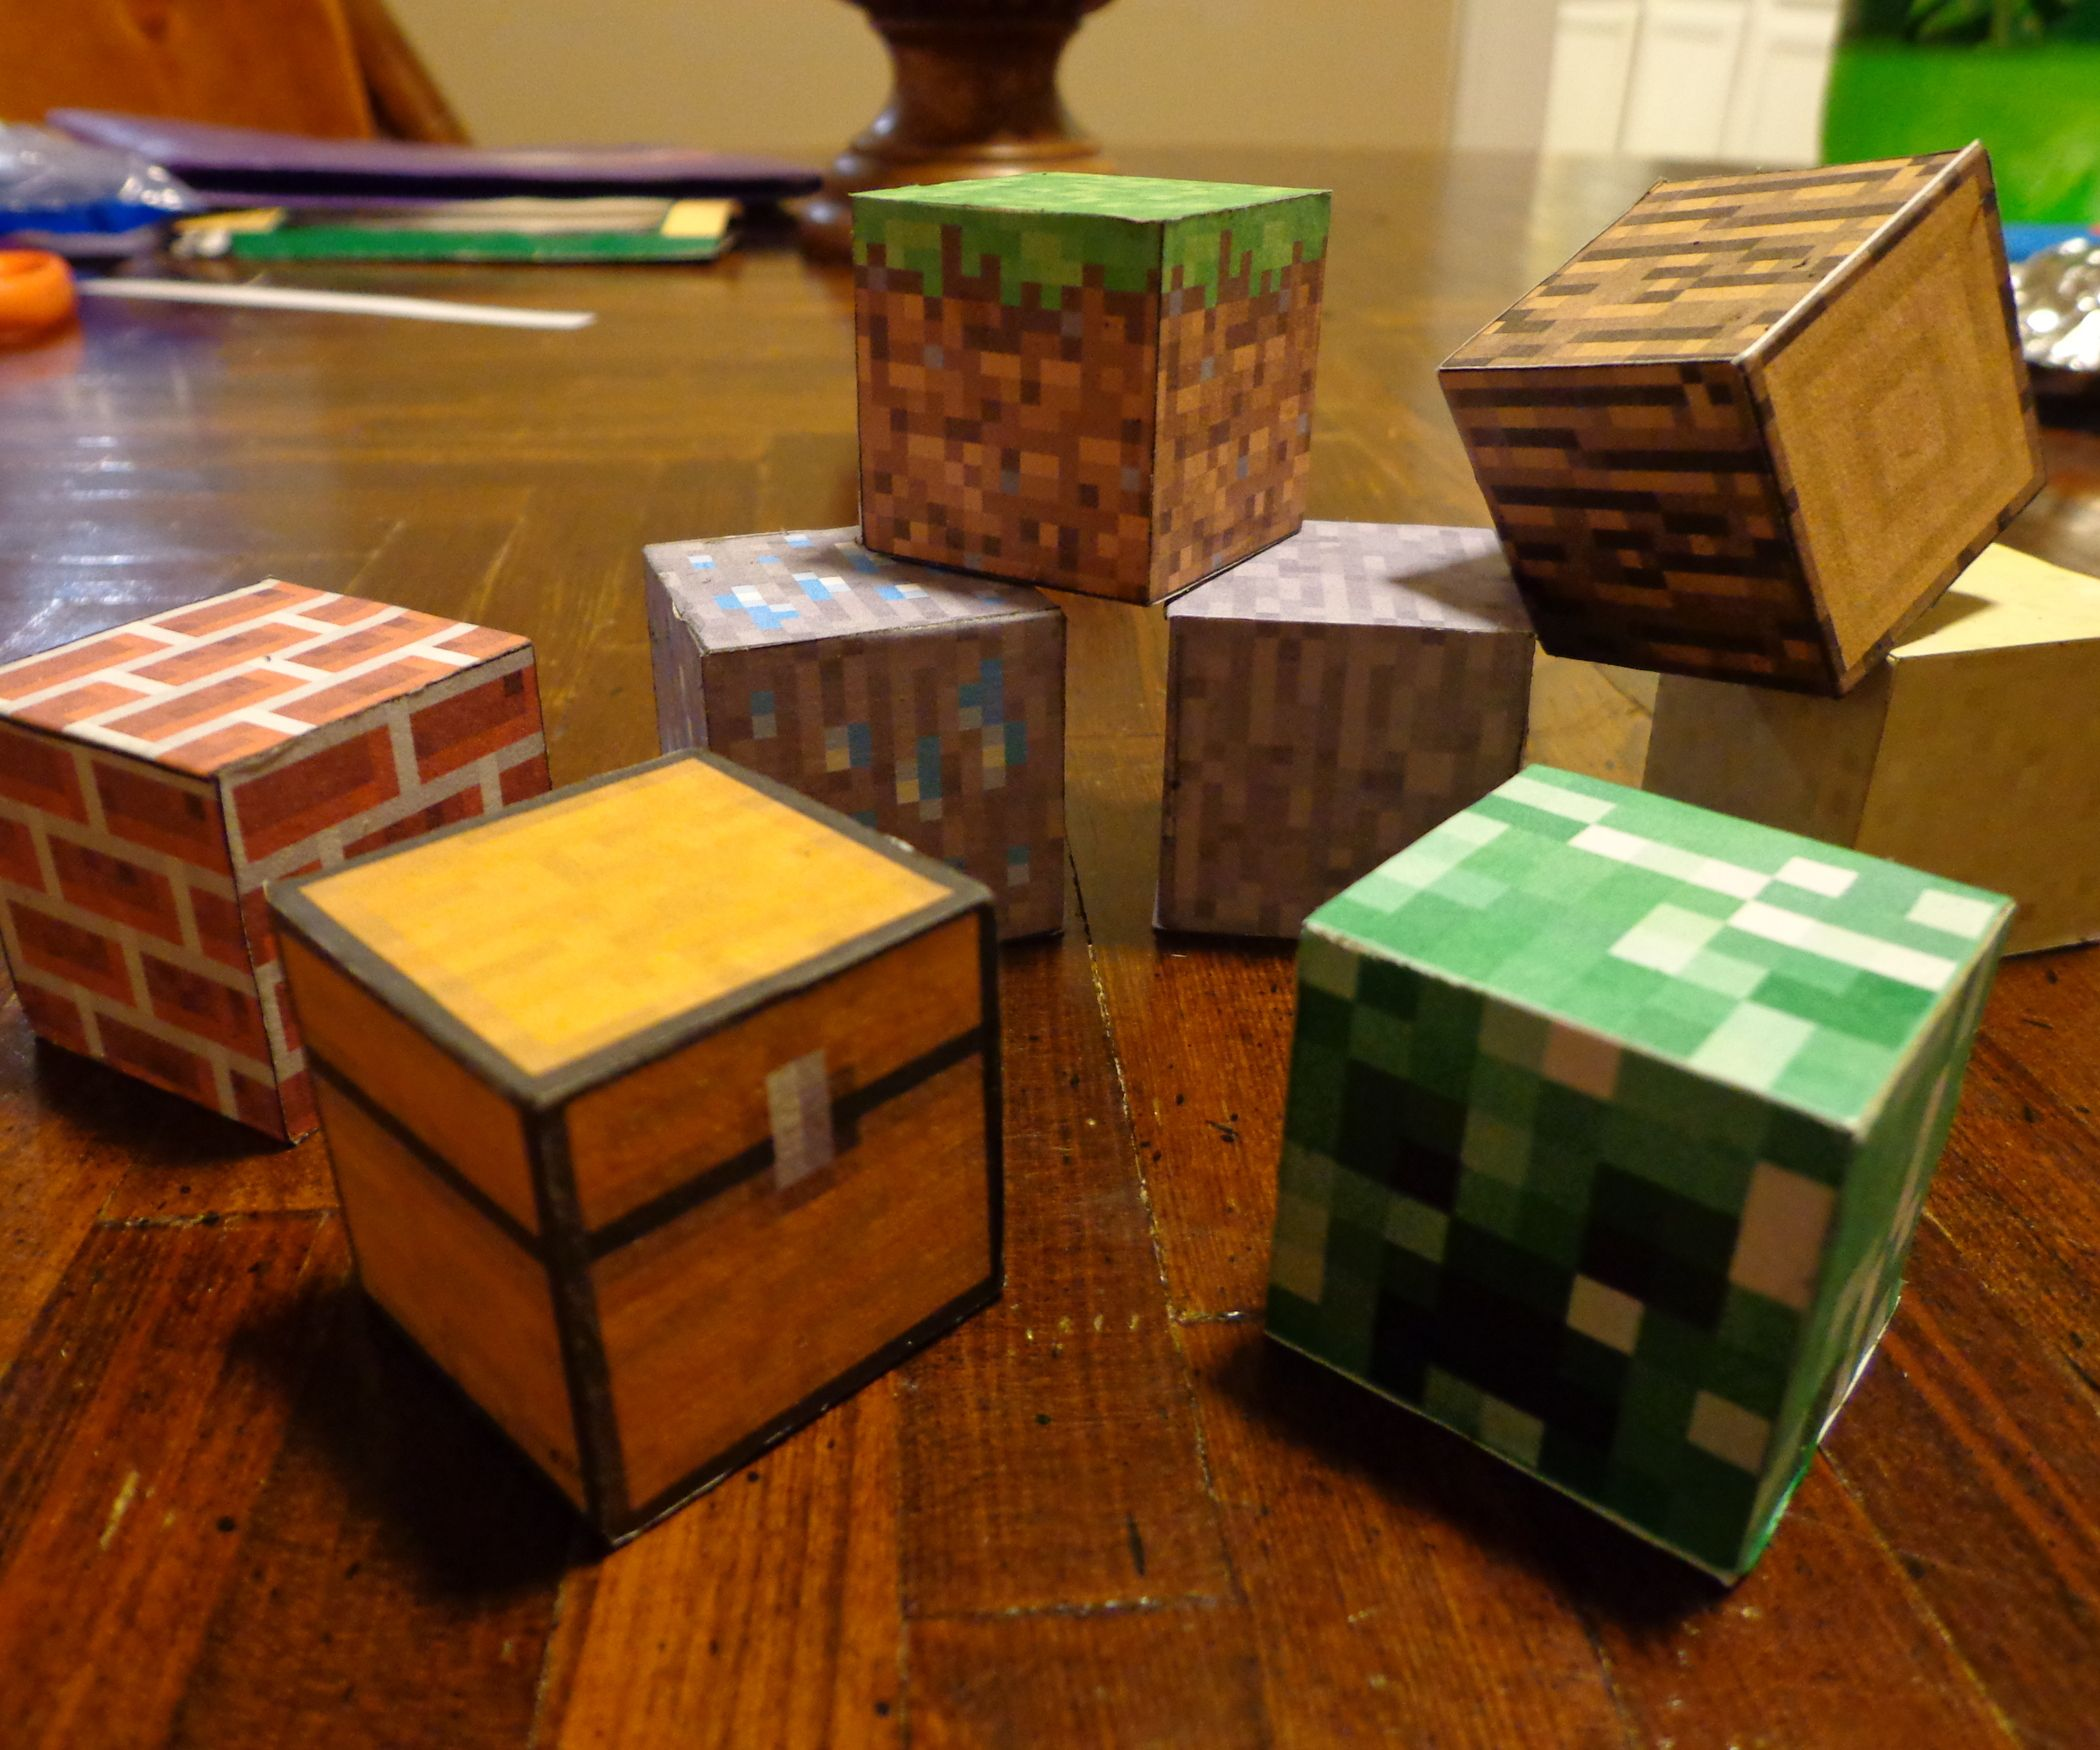 Real Minecraft Blocks Boy Crazy Pinterest Minecraft Blocks